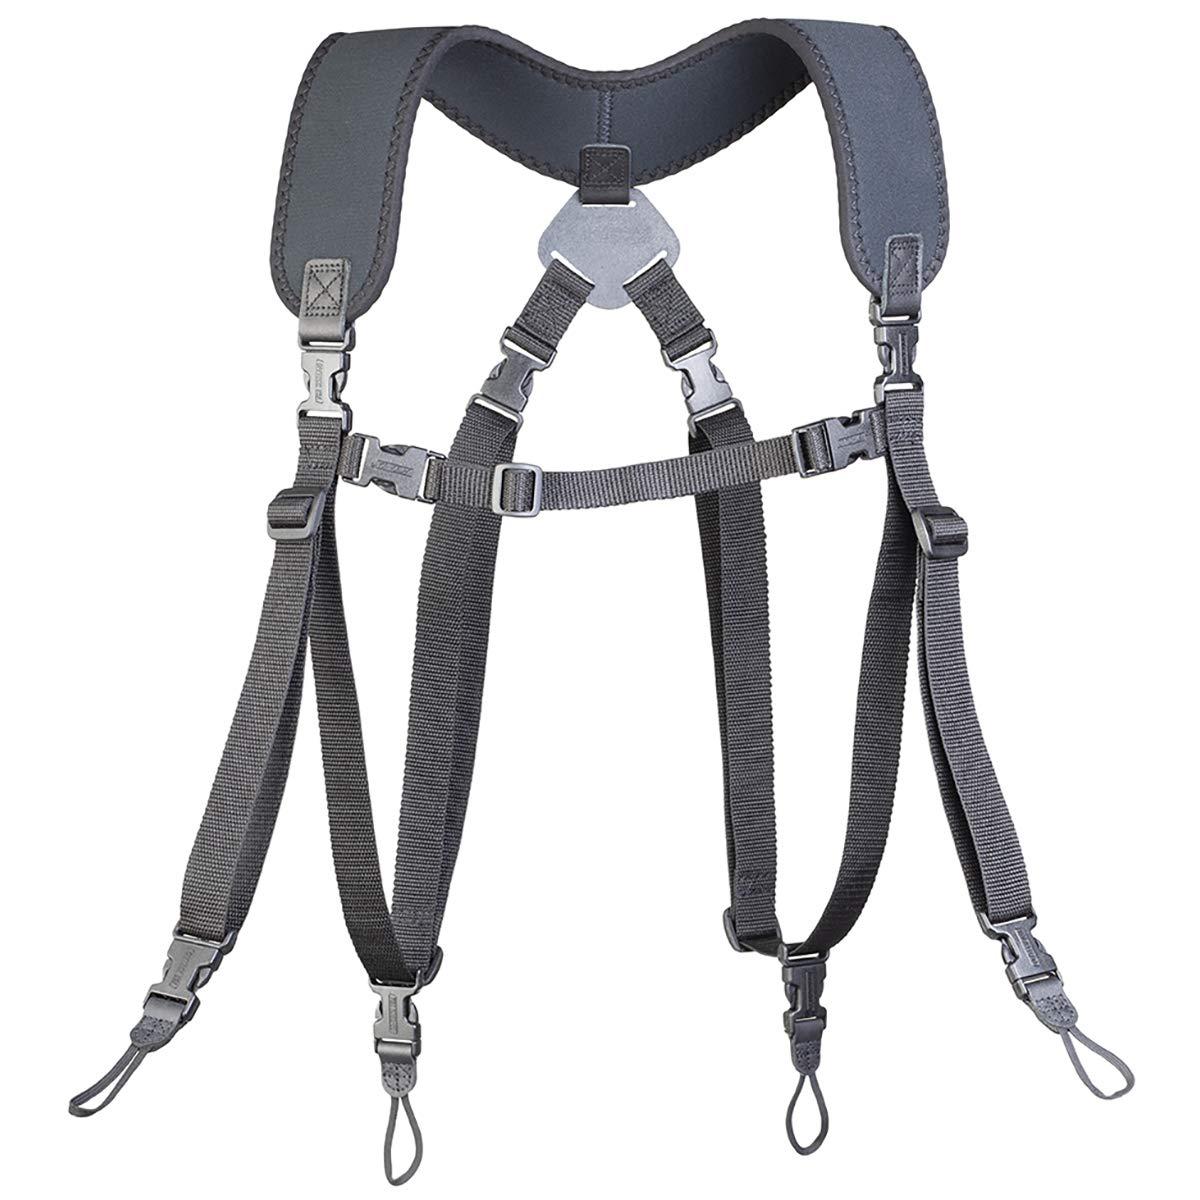 OP/TECH USA Dual Harness, Uni-Loop, Regular (6501062), Black